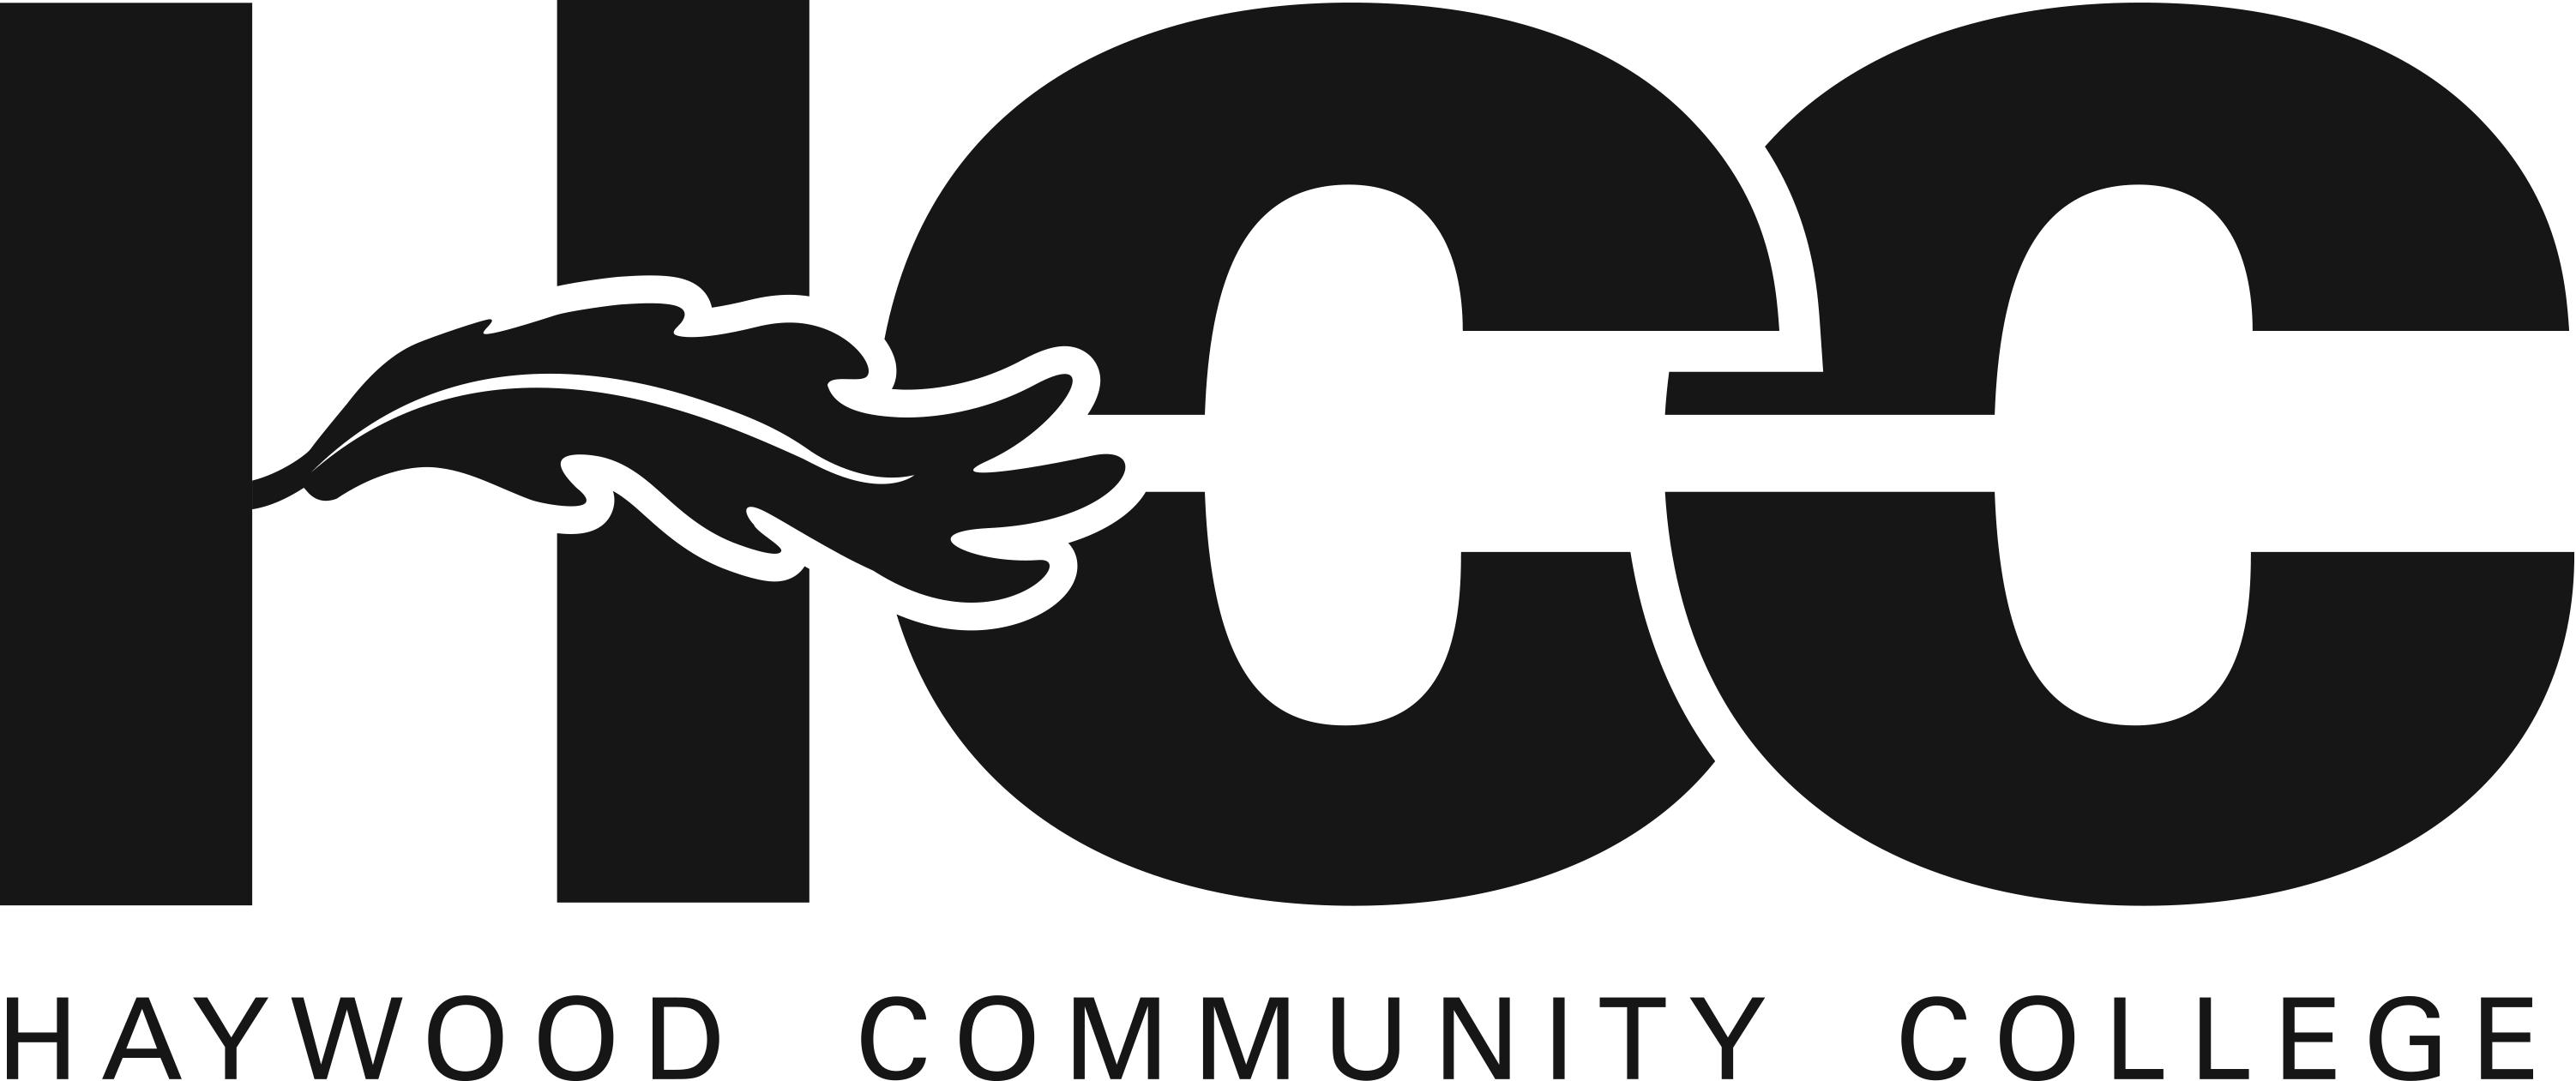 Hcc Logos.